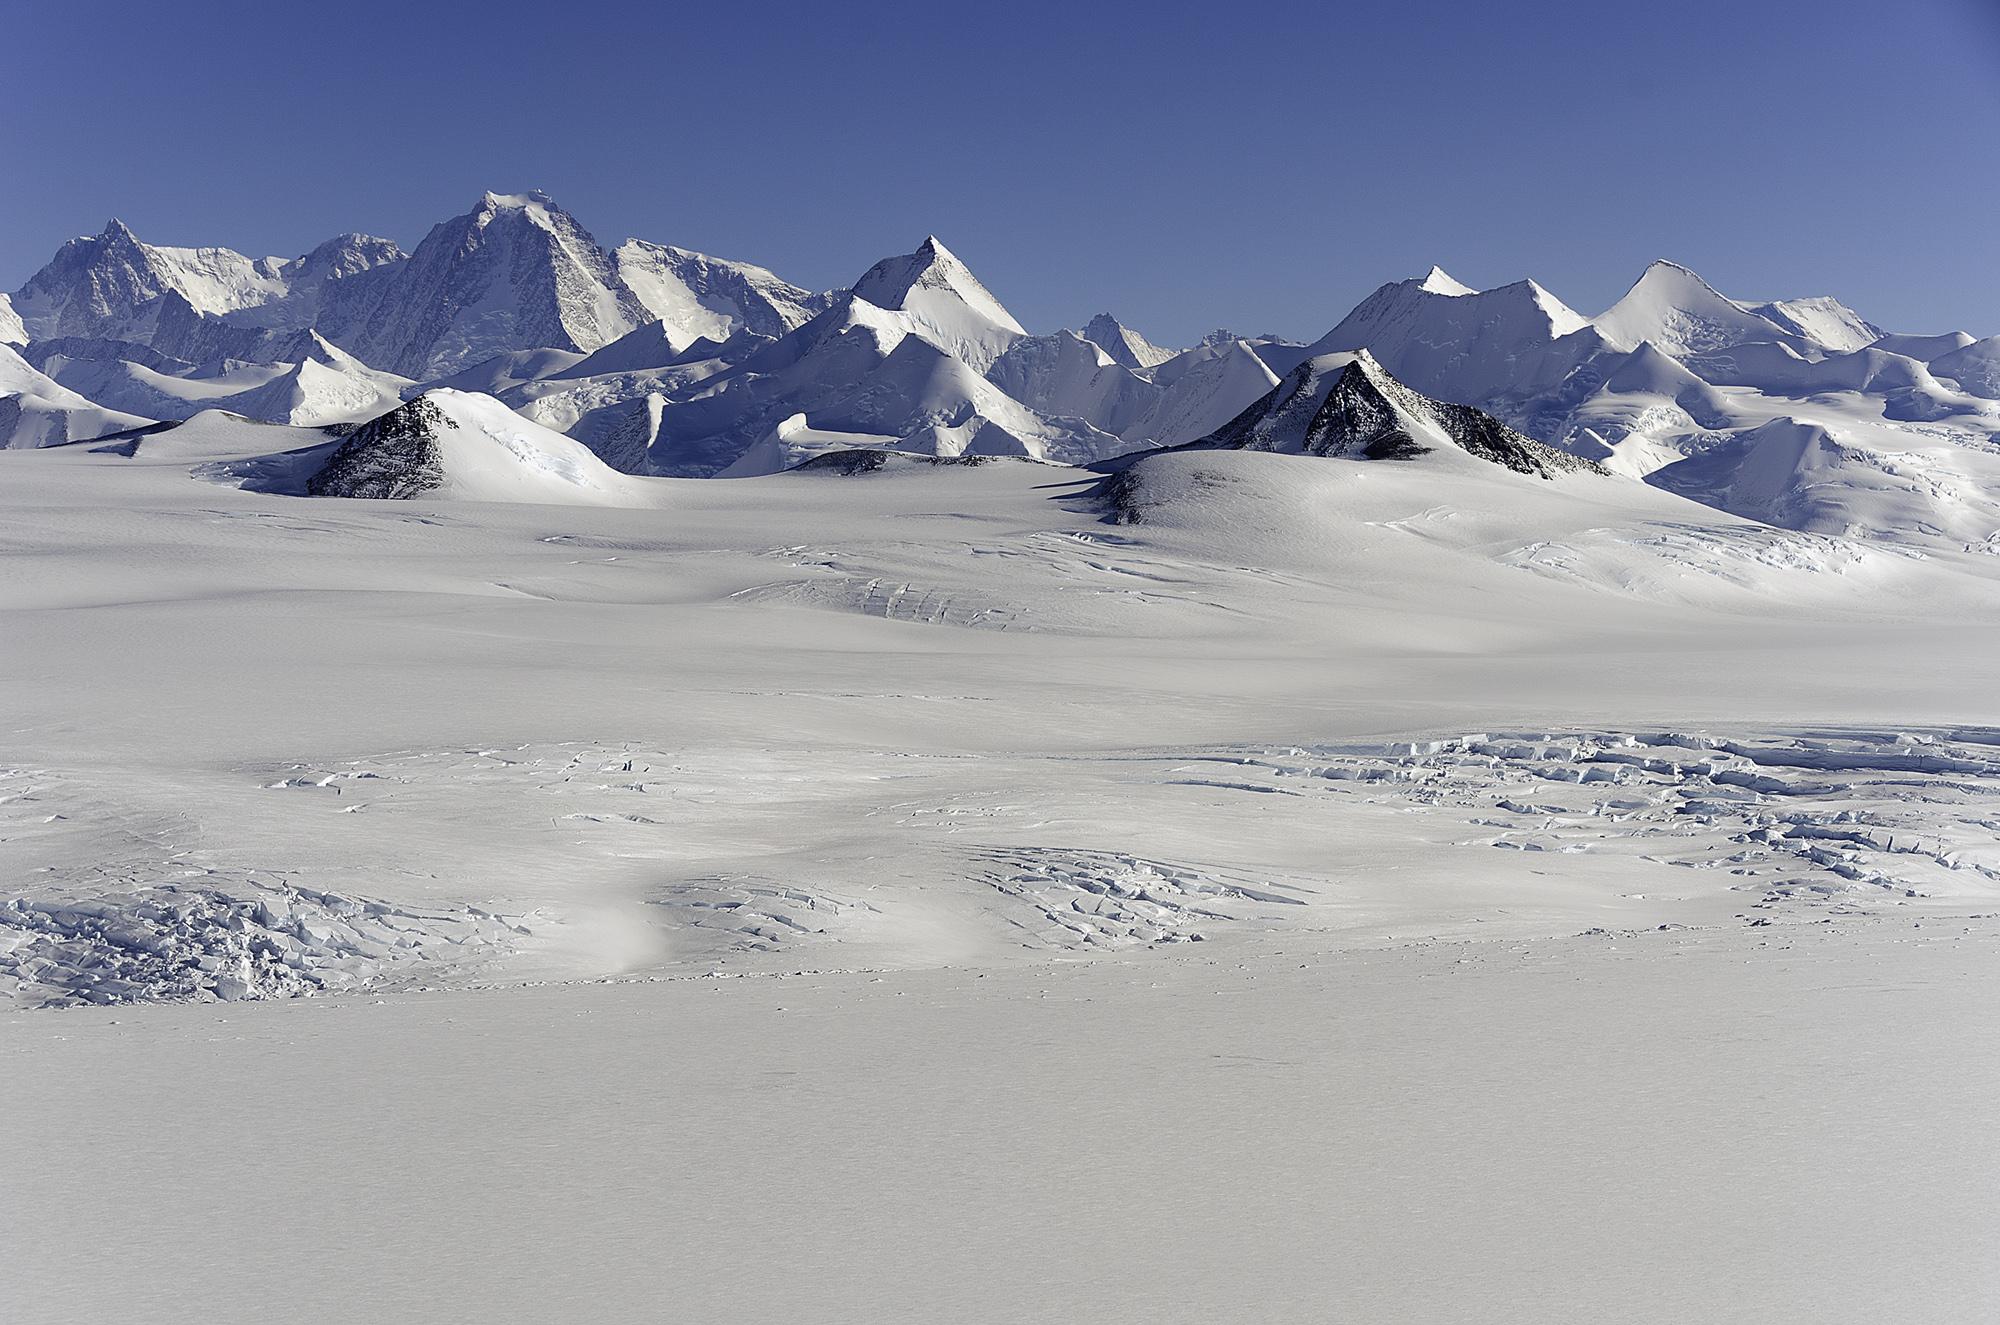 Sentinel_Range,_Ellsworth_Mountains,_Antarctica.jpg